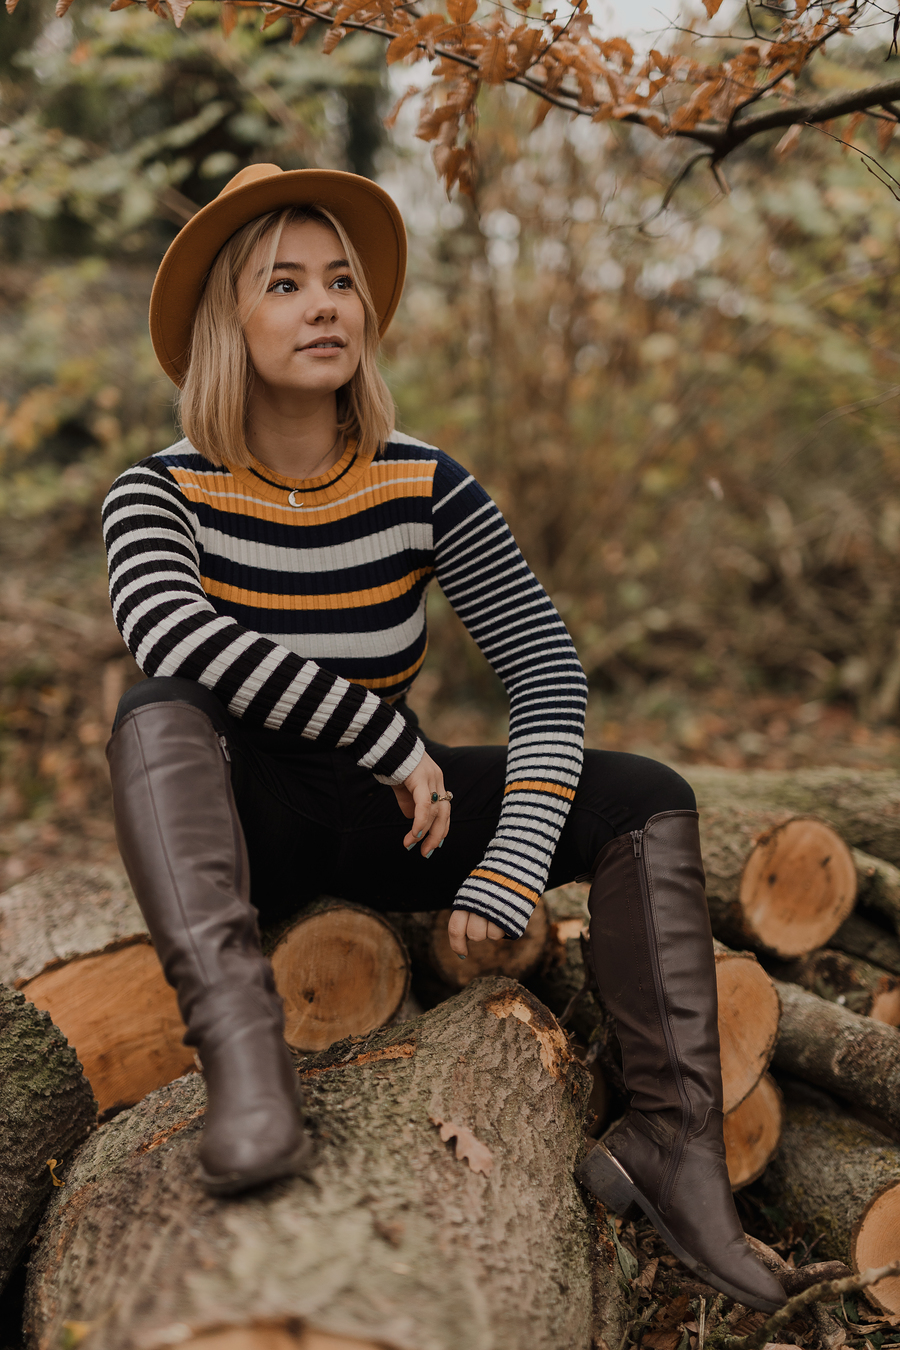 Chop wood. / Photography by Scott Davis / Uploaded 26th November 2020 @ 09:27 AM